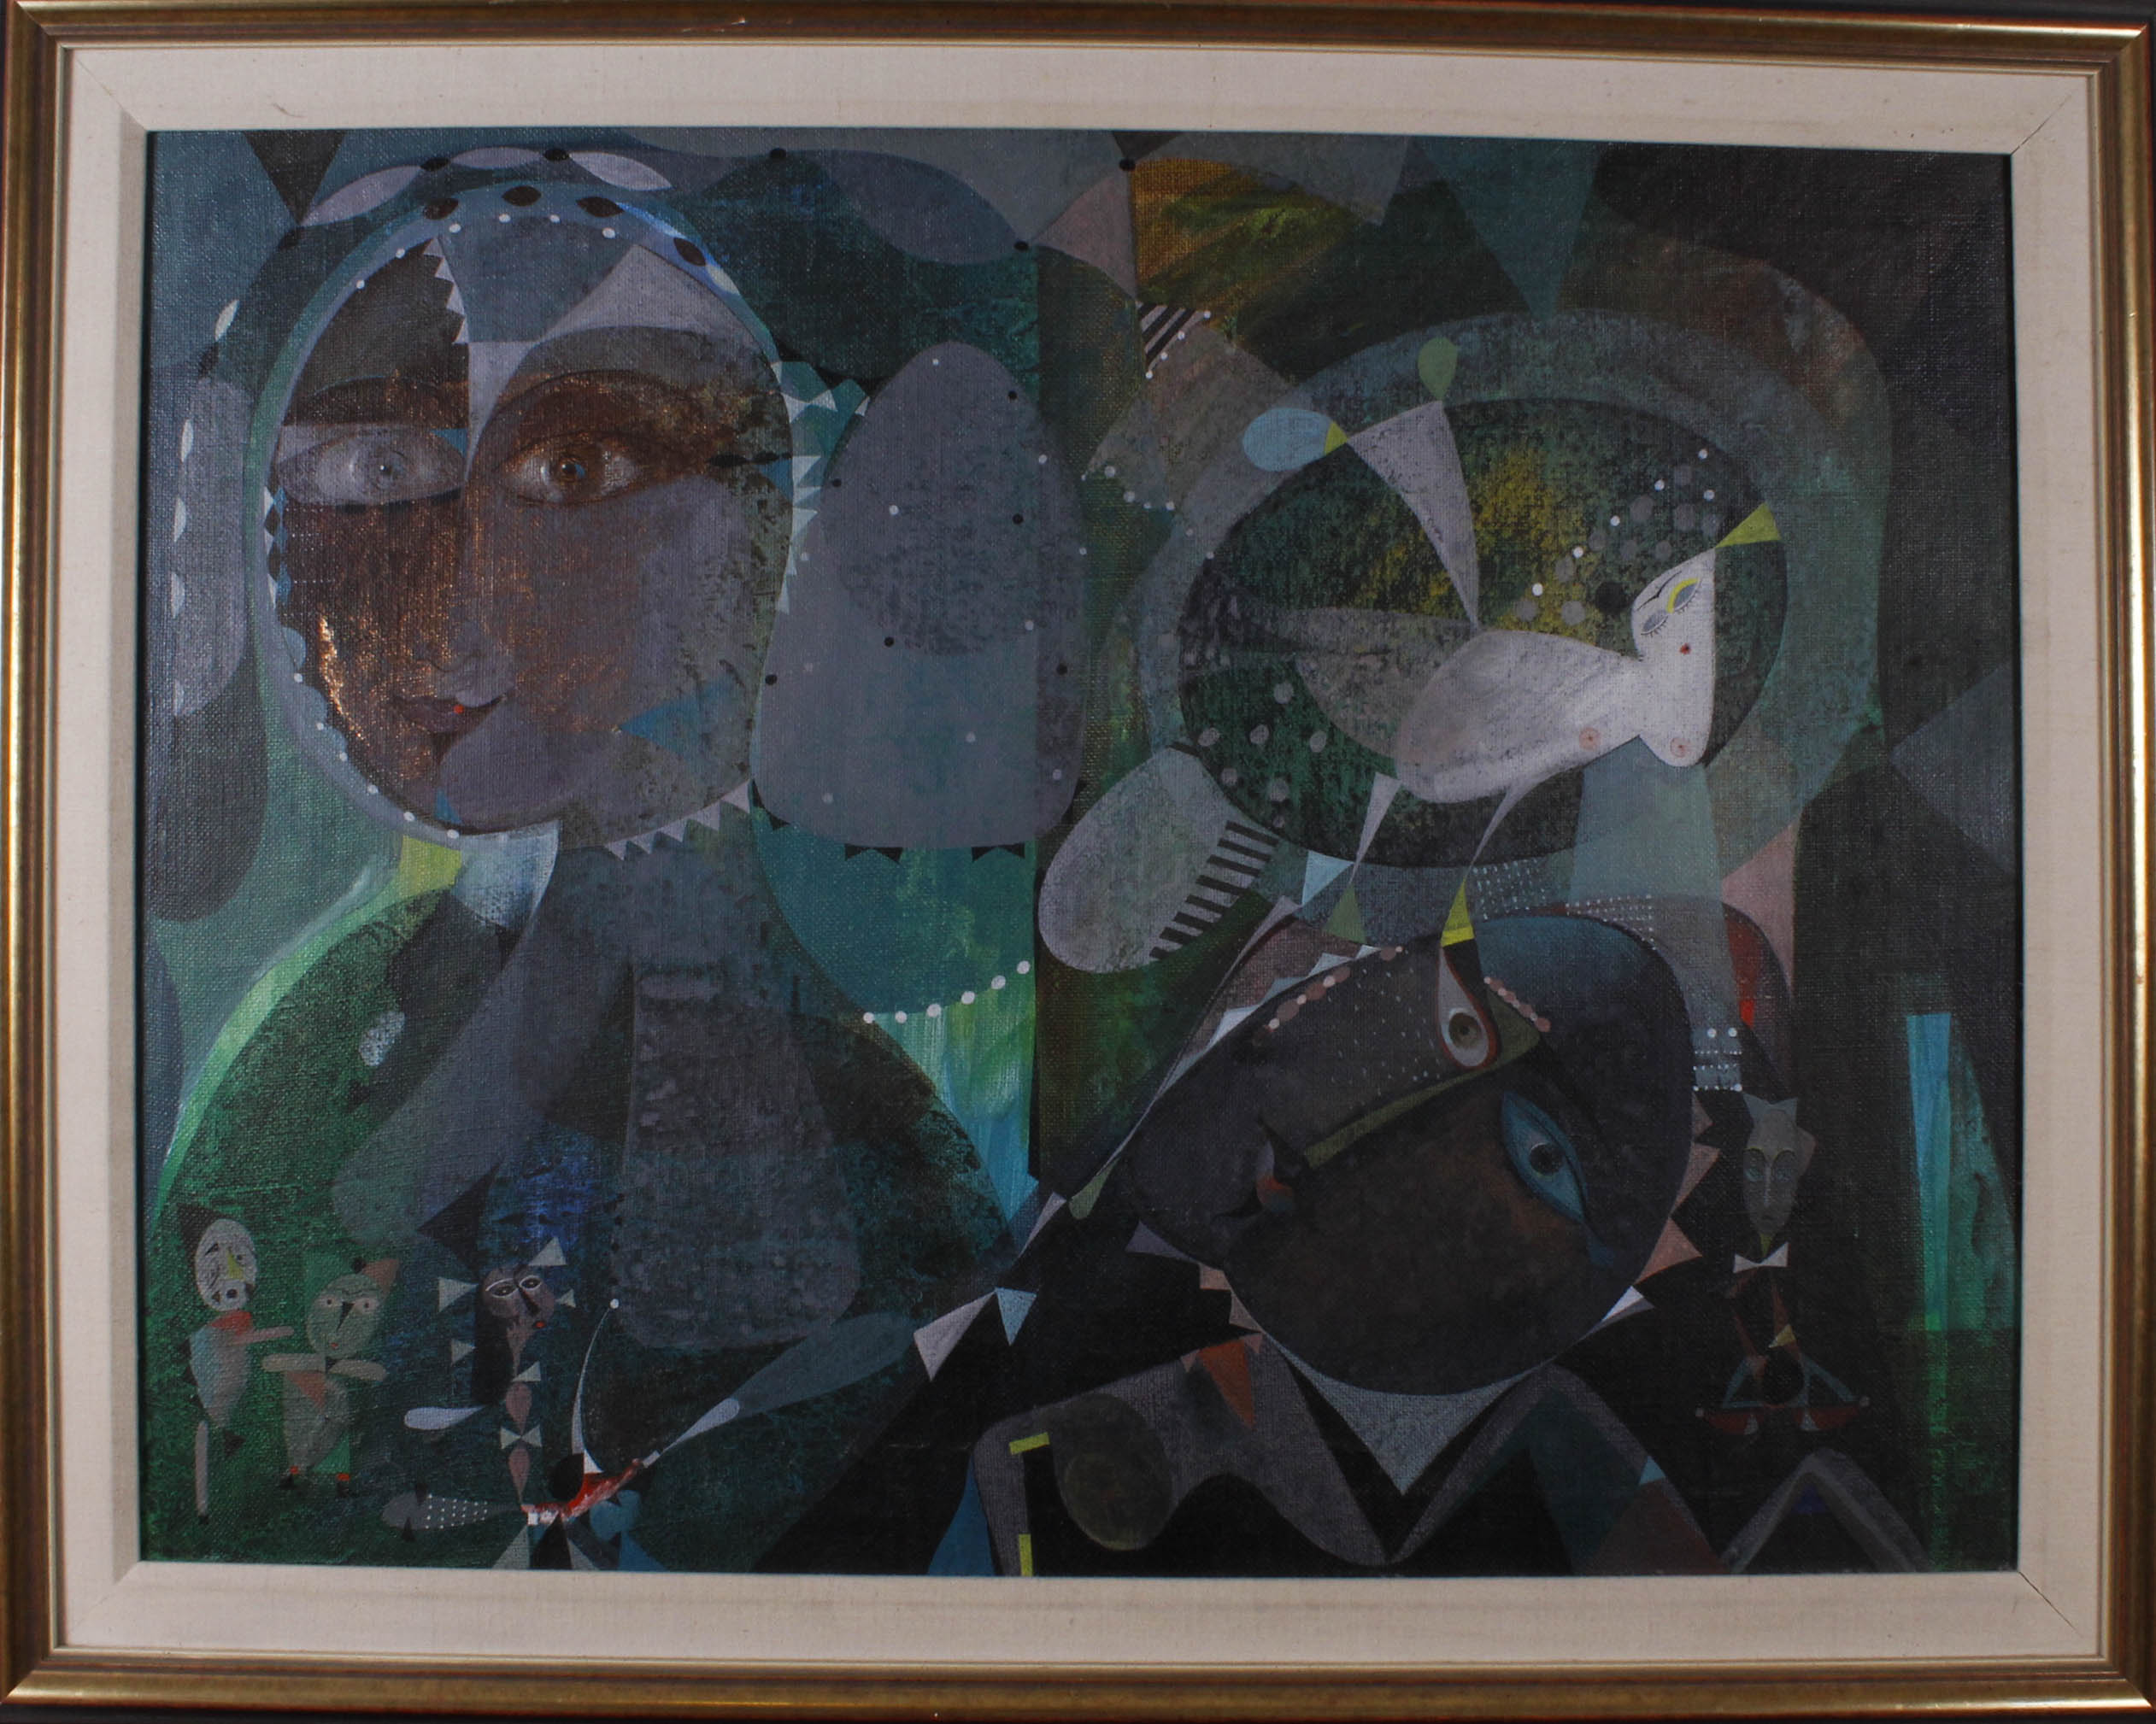 GRIP Alexander (ur. 1956) Kompozycja z postaciami